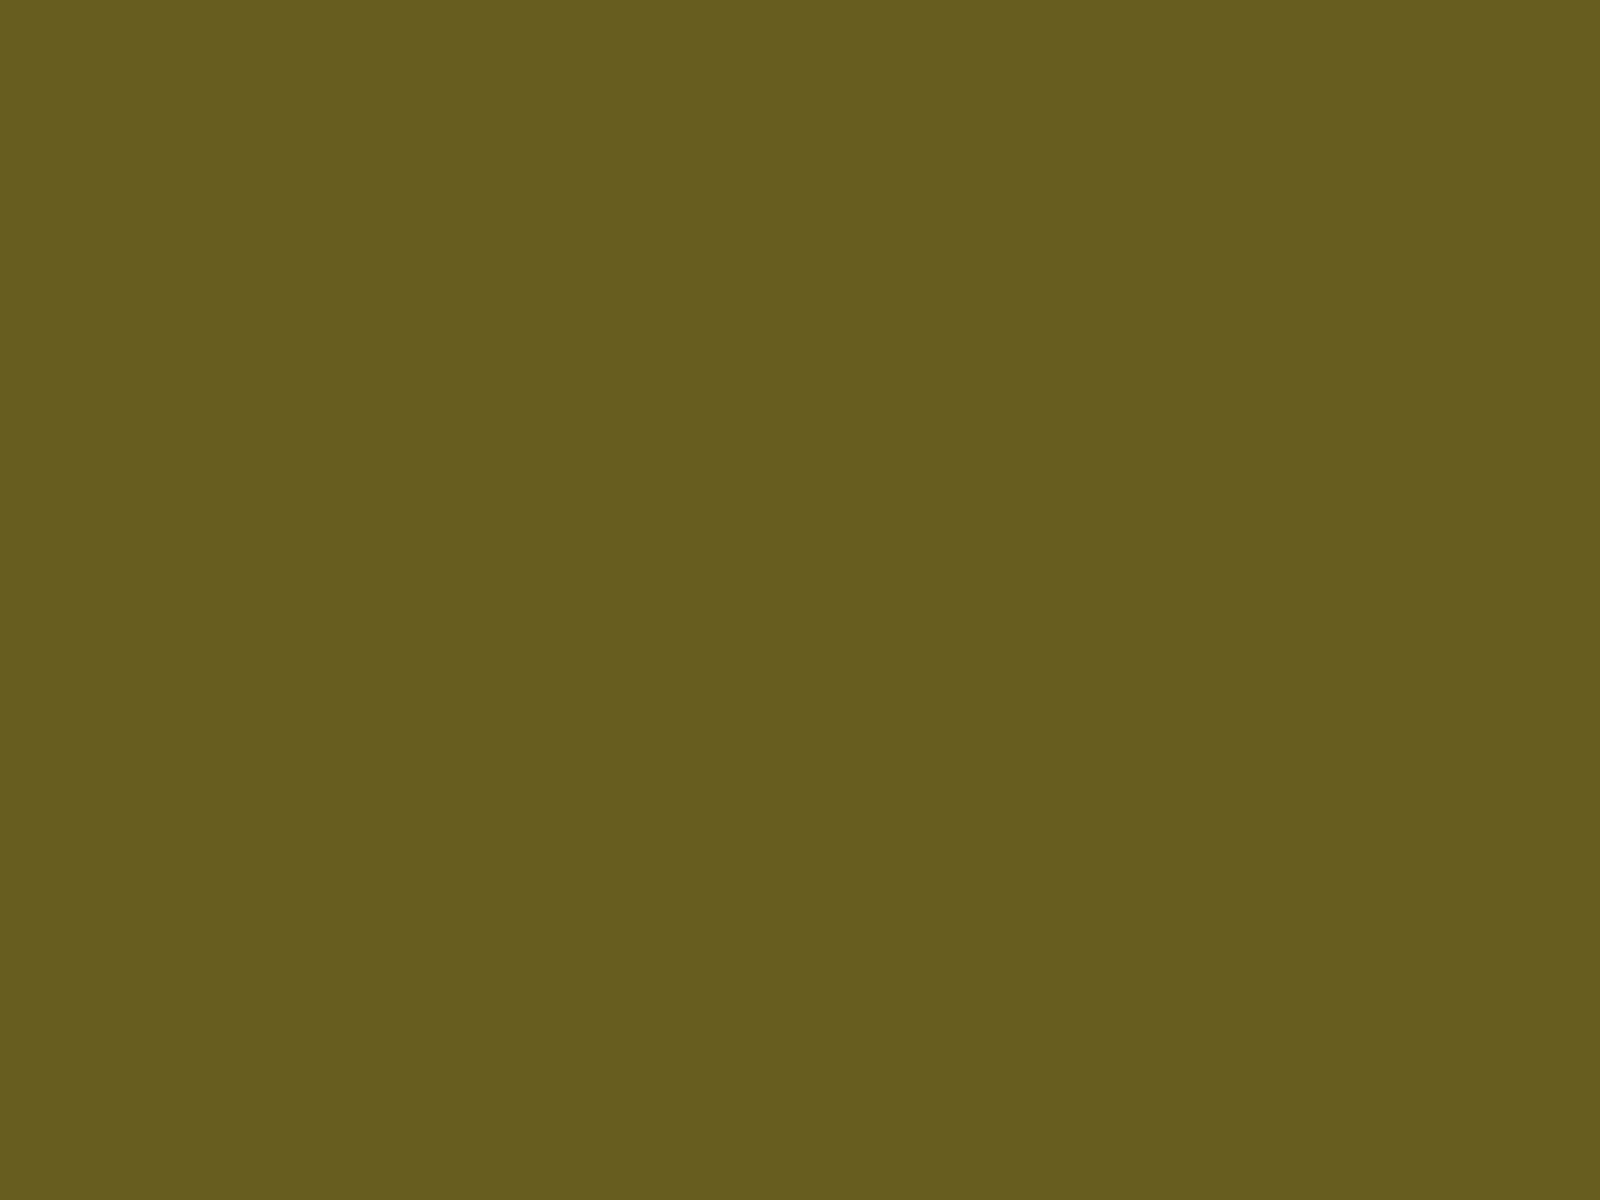 1600x1200 Antique Bronze Solid Color Background